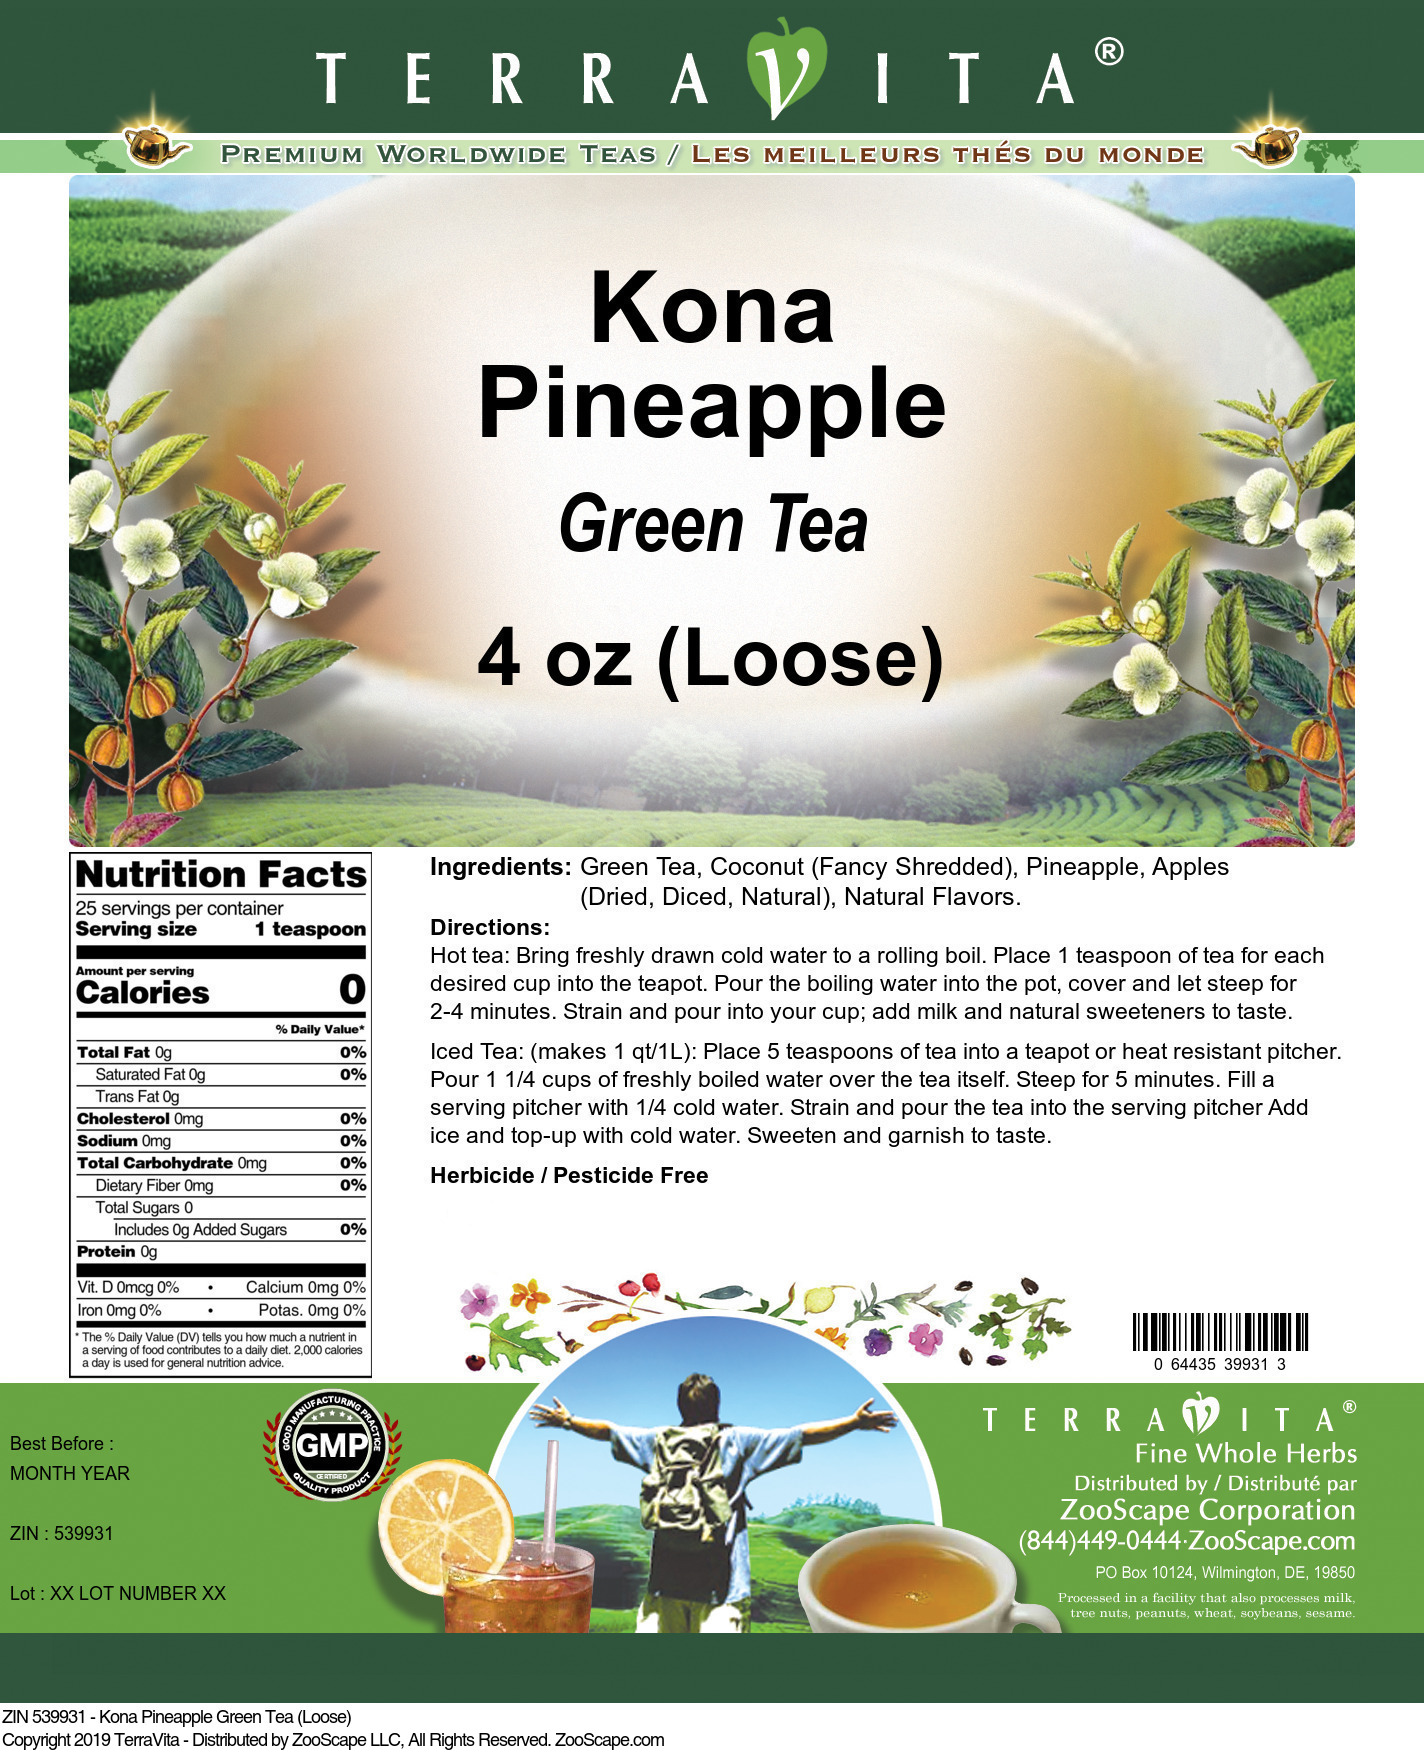 Kona Pineapple Green Tea (Loose)